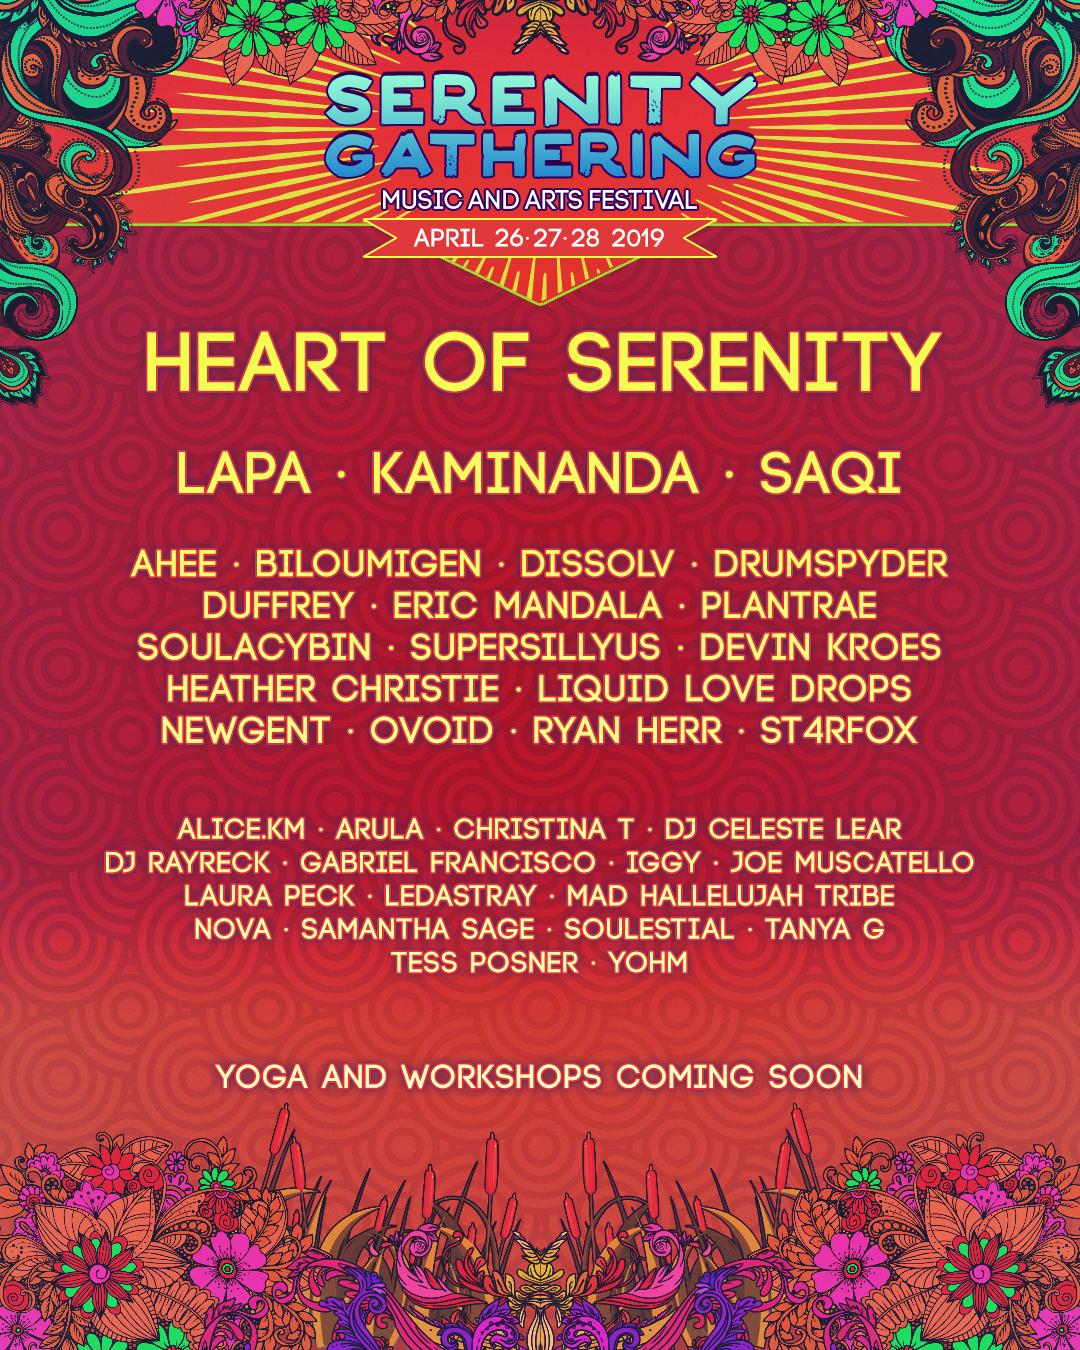 Serenity Gathering - NOVA feat. Samantha Sage @ 3am Sunday April 28Heart of Serenity Stage